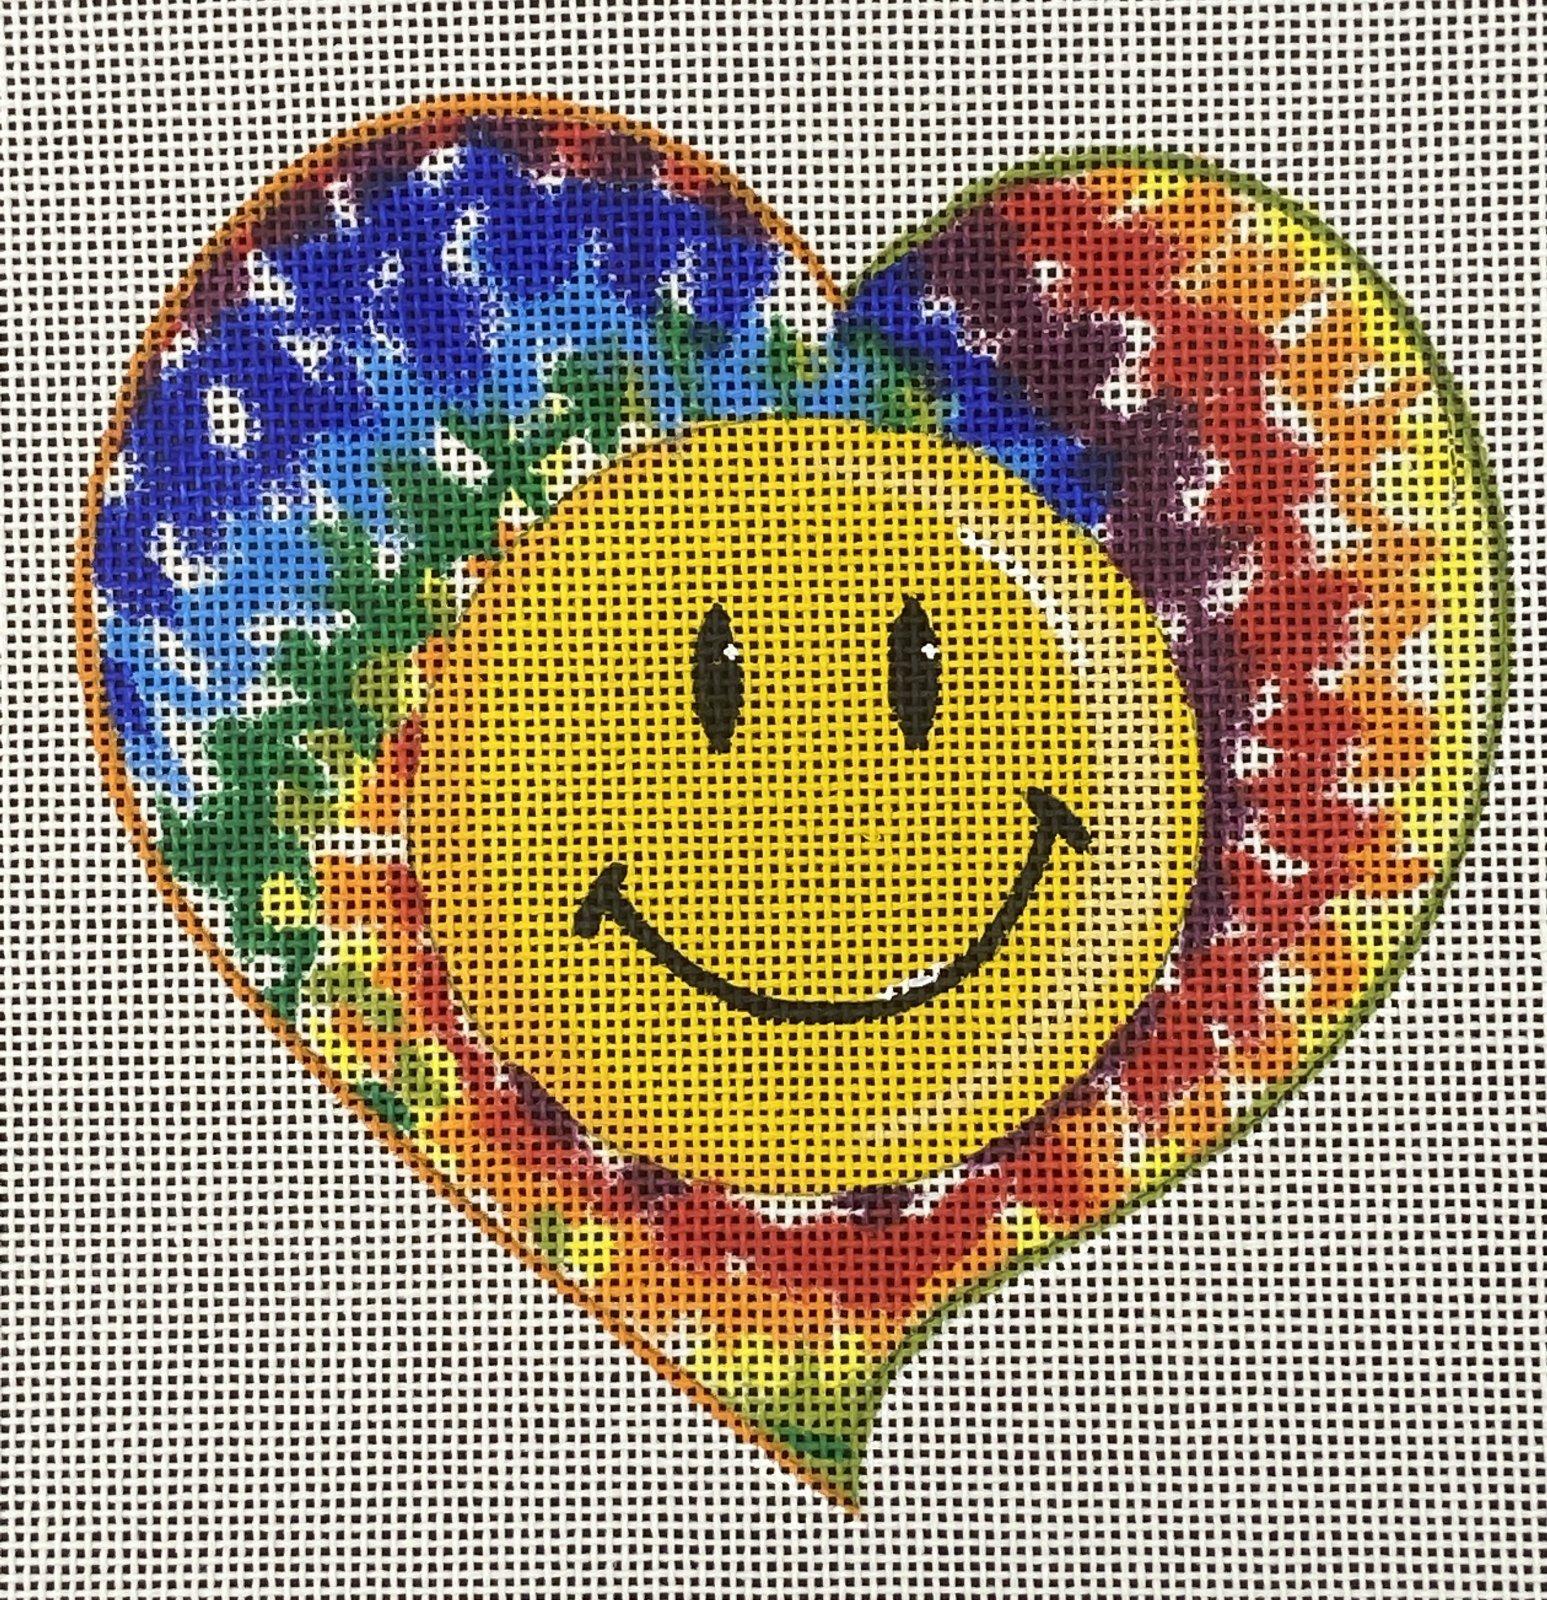 JMKL16965 Smiley Face Pride PLD Designs